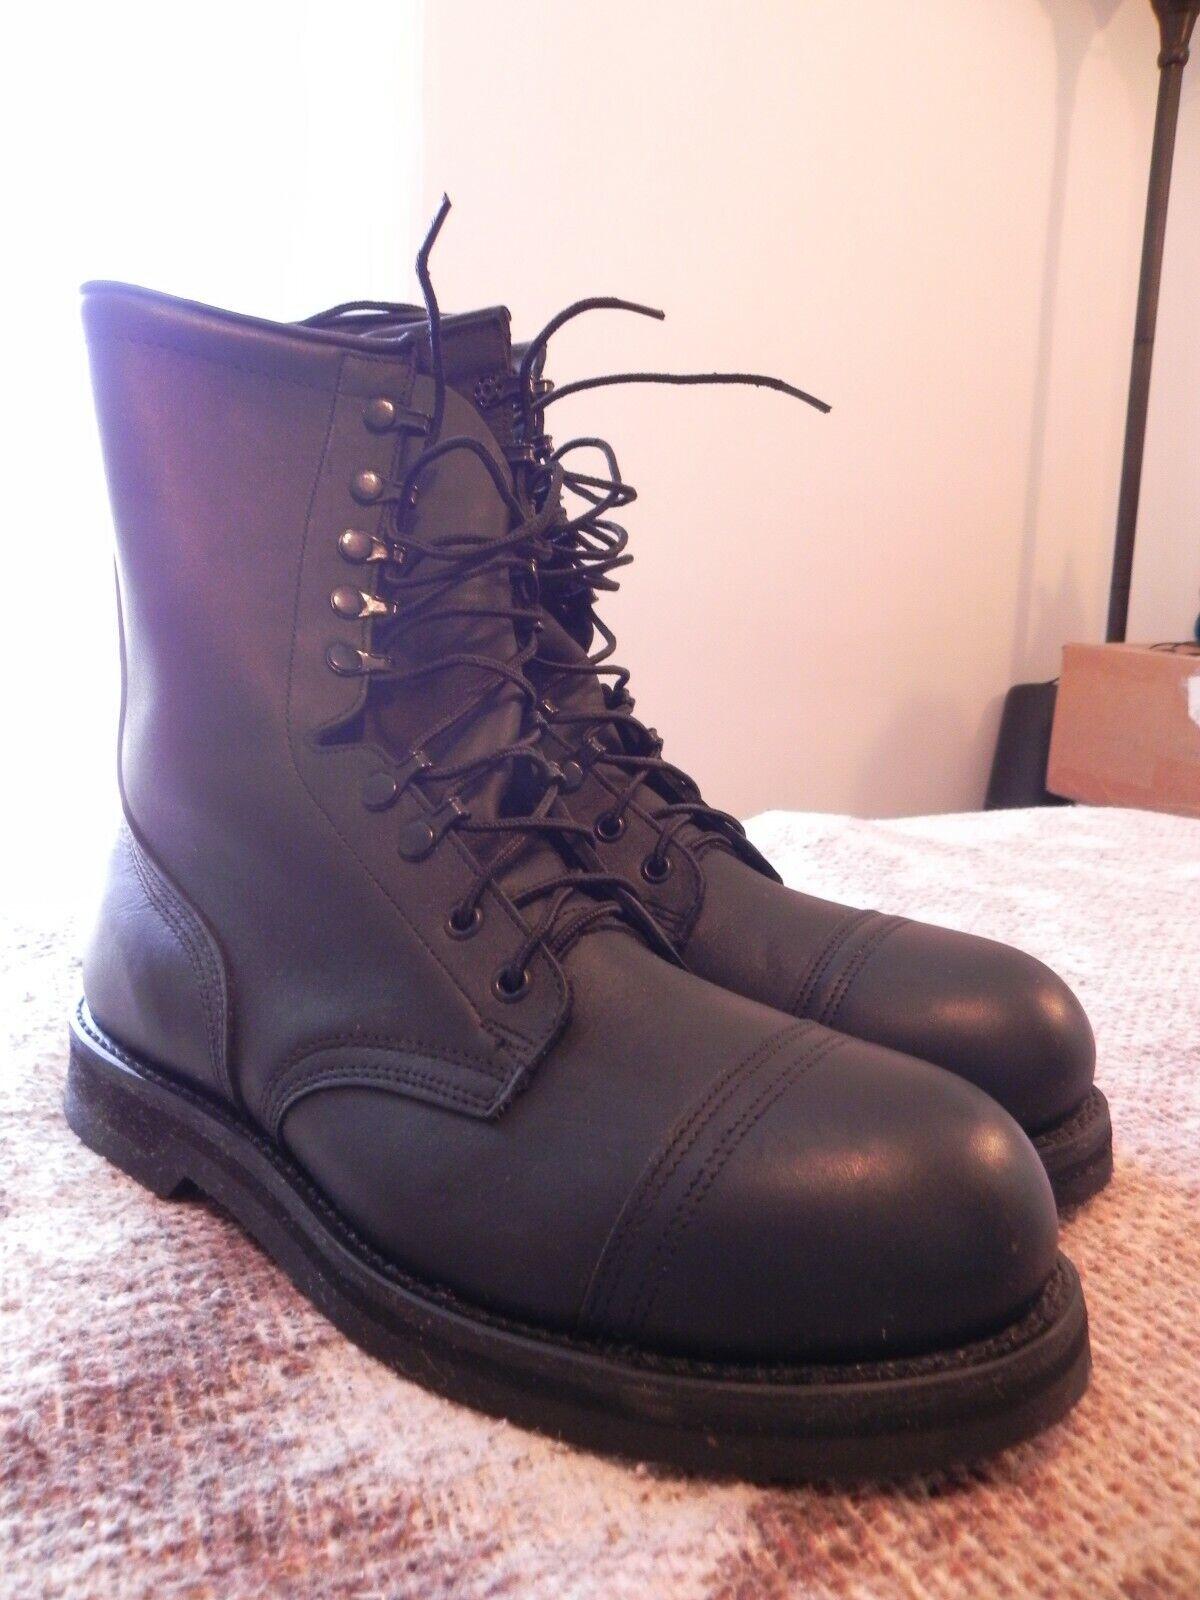 Vibram Addison shoes Company, Men's Military Combat Boots Size 10